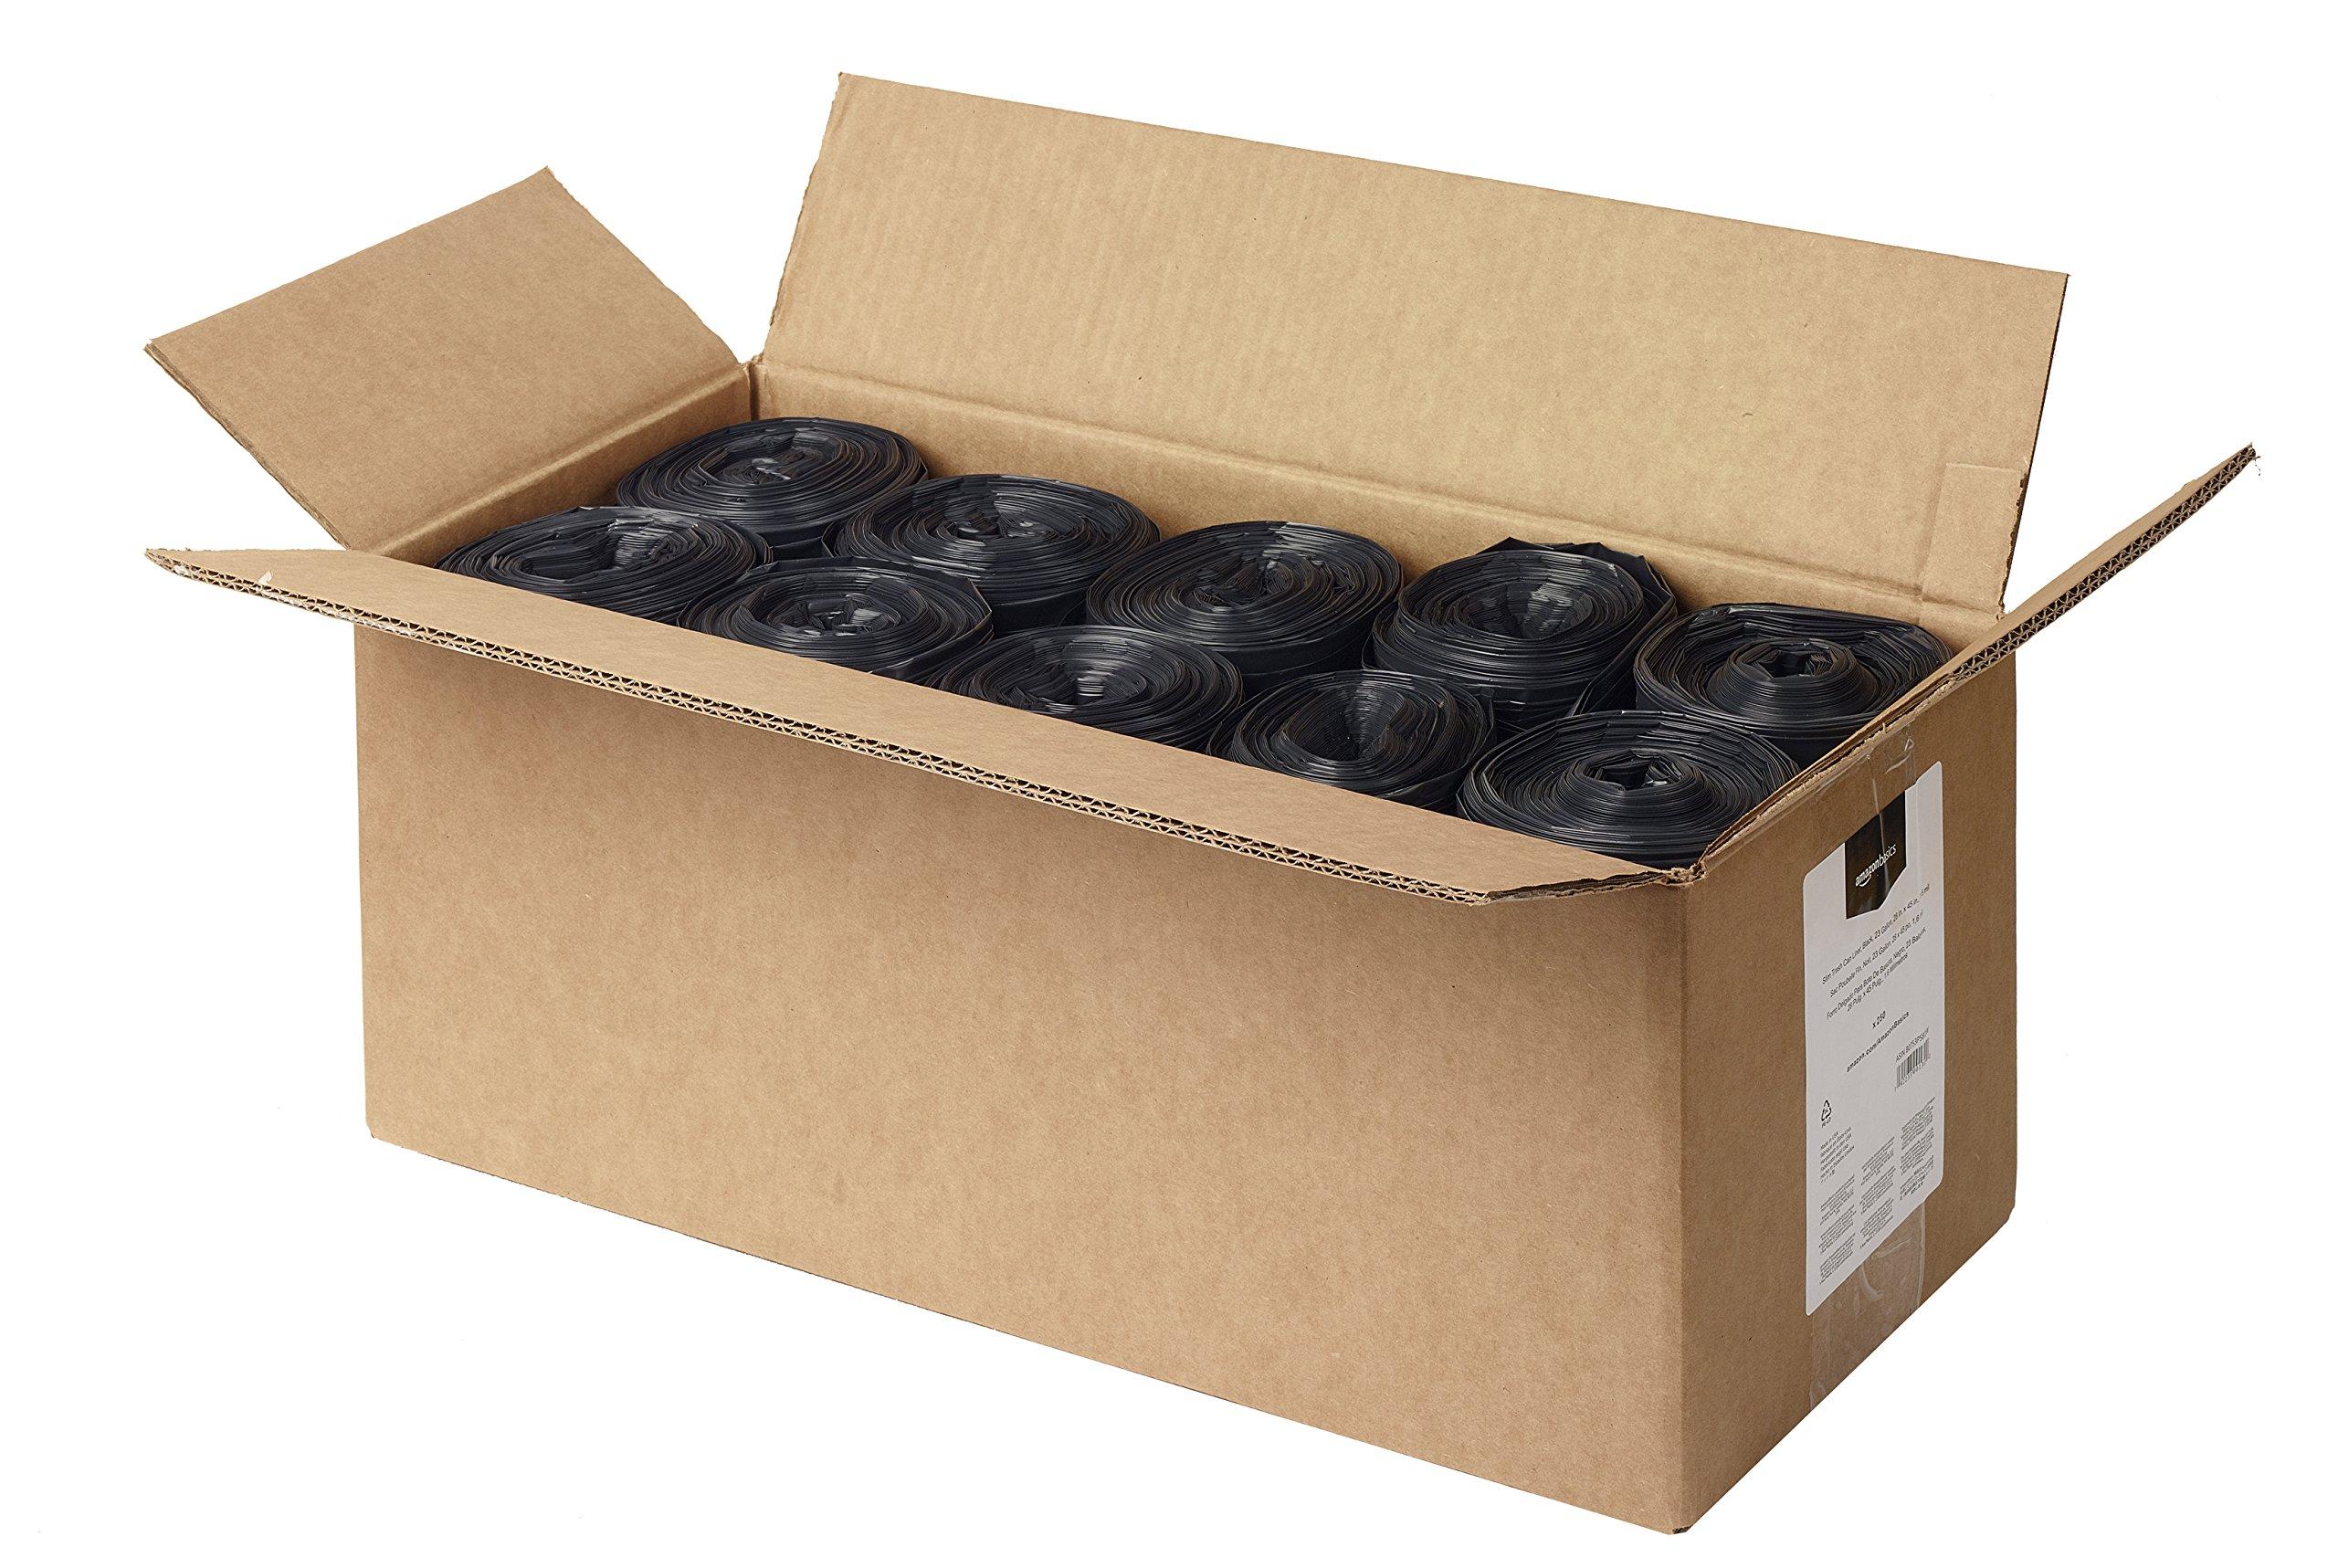 AmazonBasics 23 Gallon Slim Trash Can Liner, 1.6 mil, Black, 250-Count by AmazonBasics (Image #3)